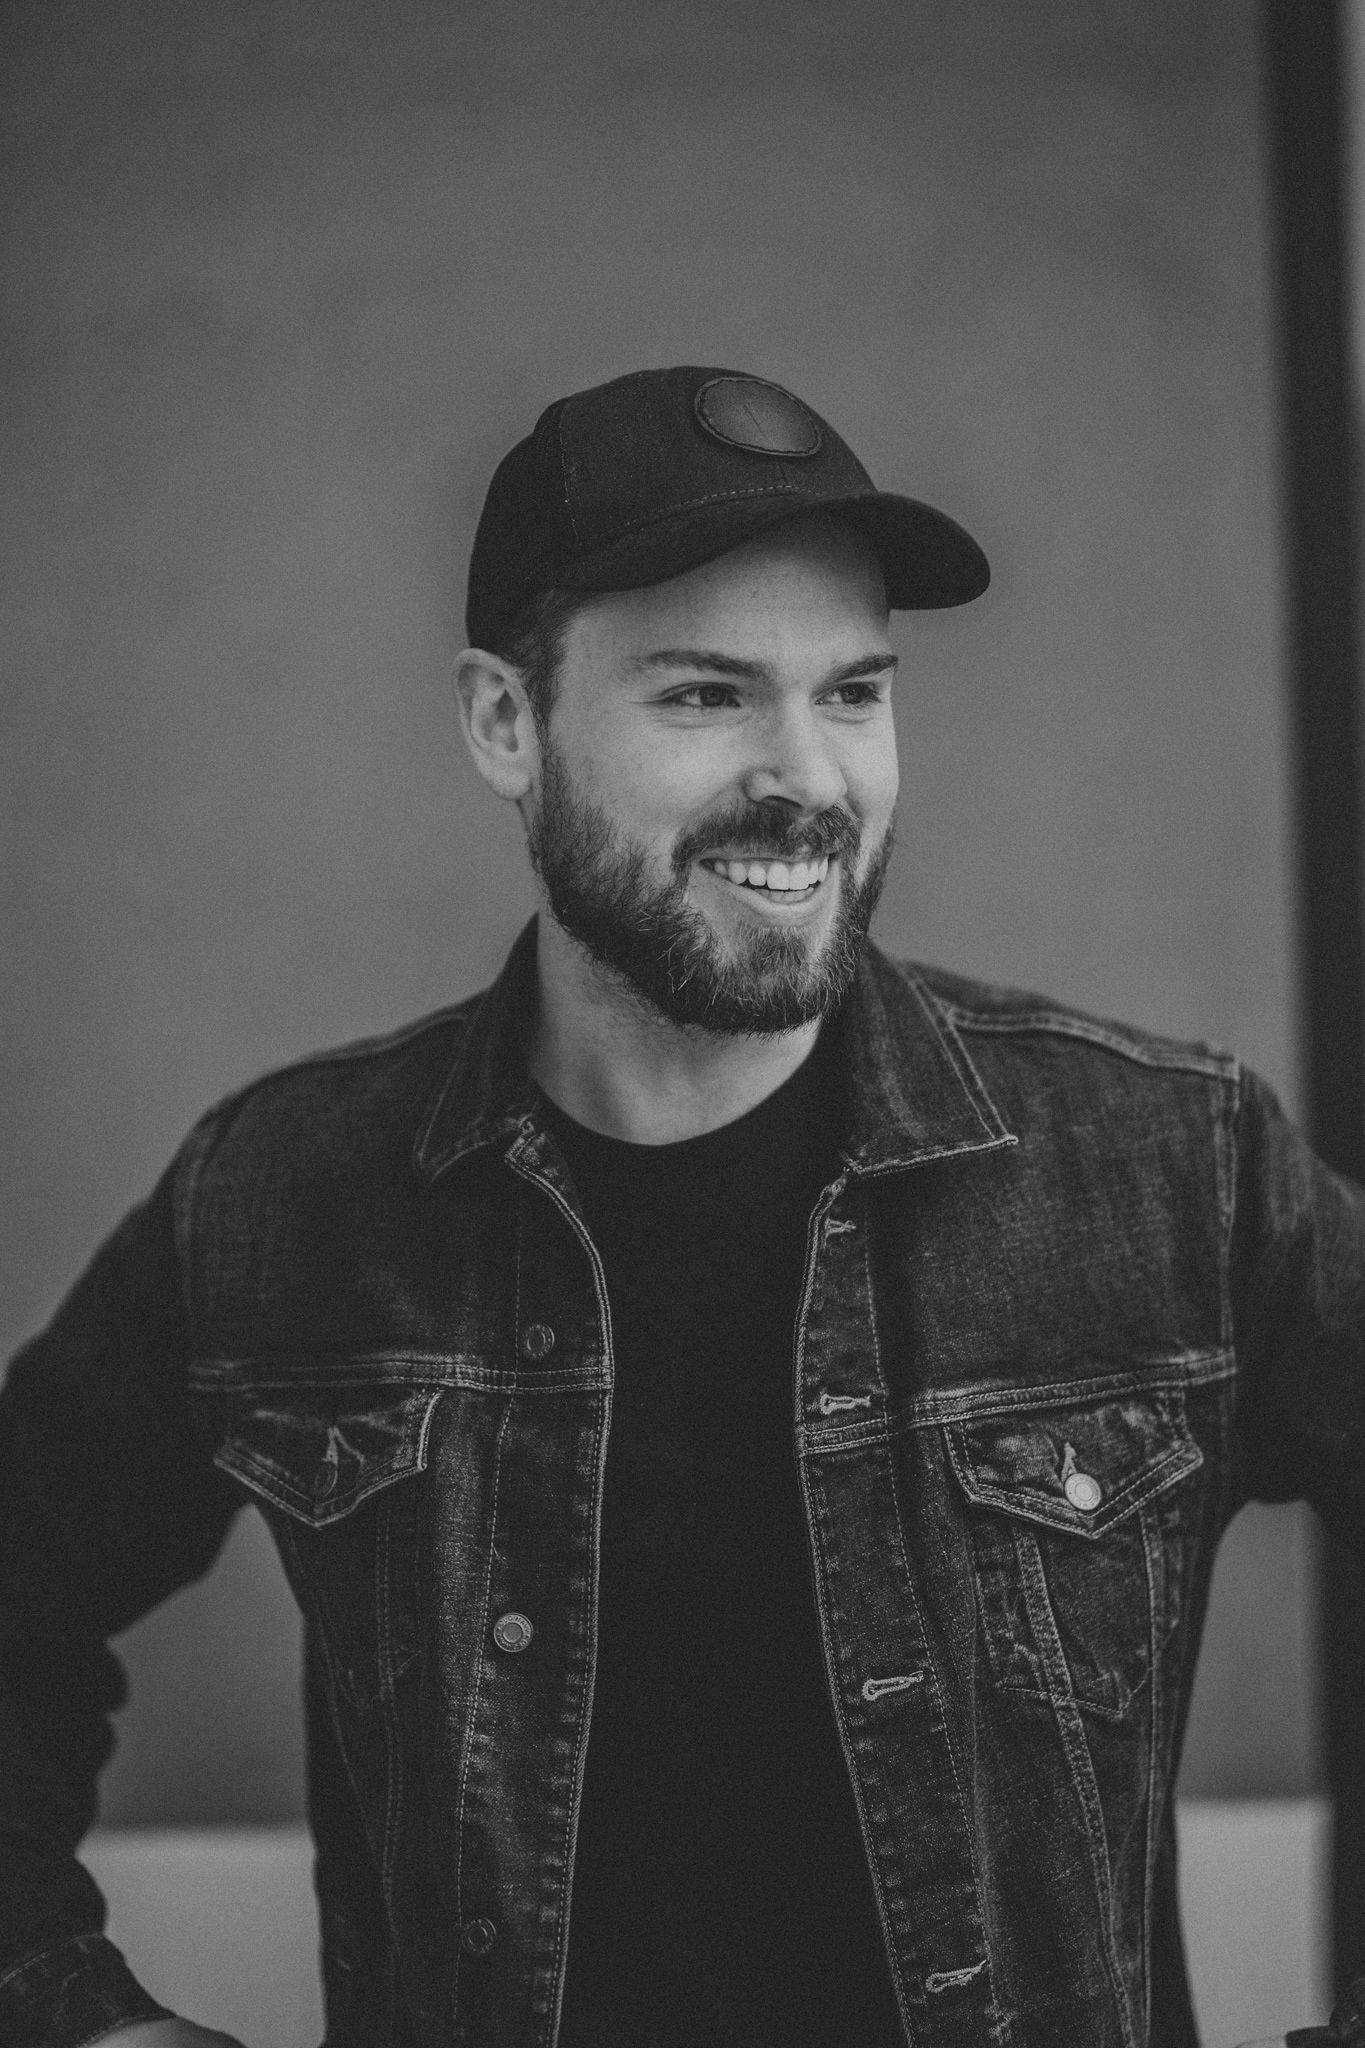 Cory Hale - Photographer/Illustrator